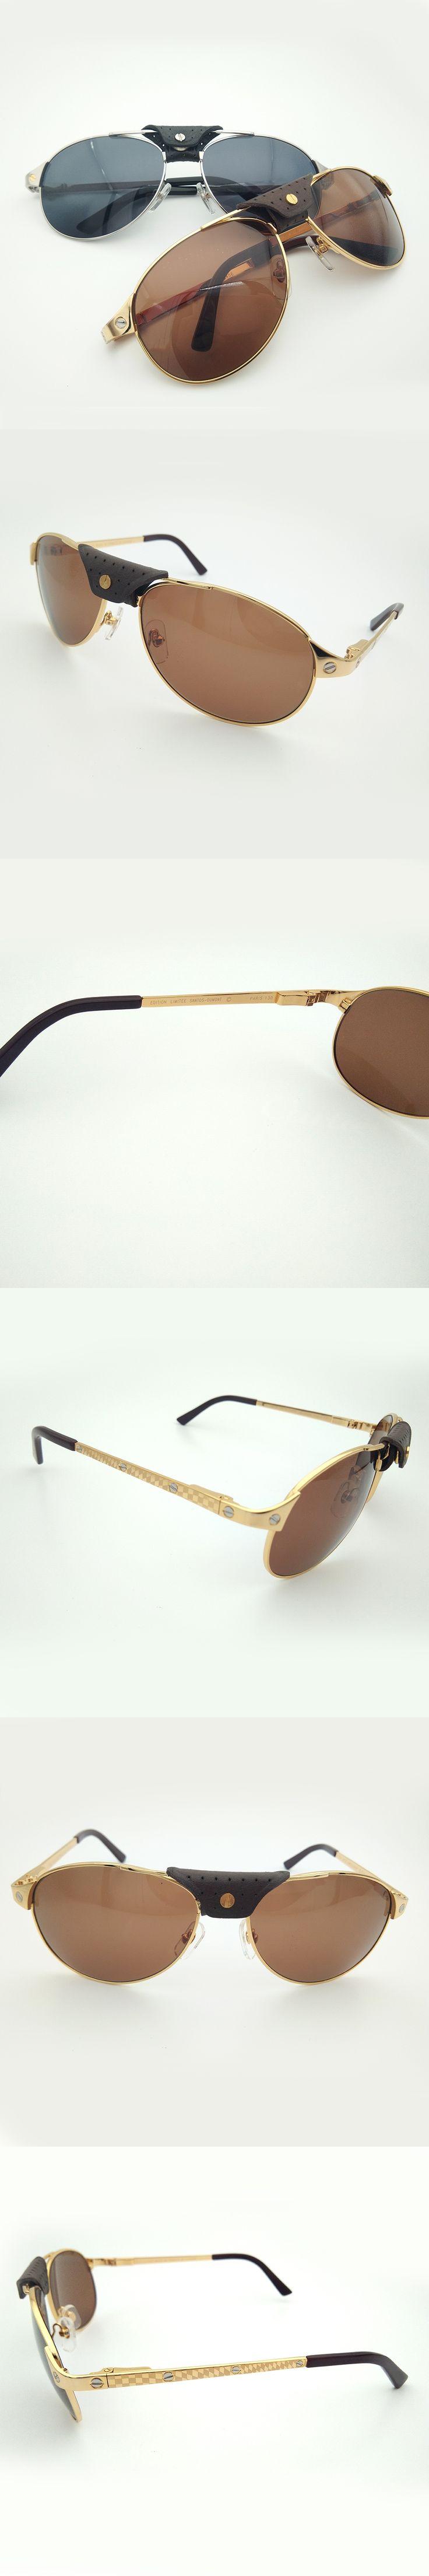 Vintage Santos Aviator Sunglasses Men Luxury Eyewear Dumont Plaid Temples Metal Sunglasses for Driving Traveling Shades Men 456